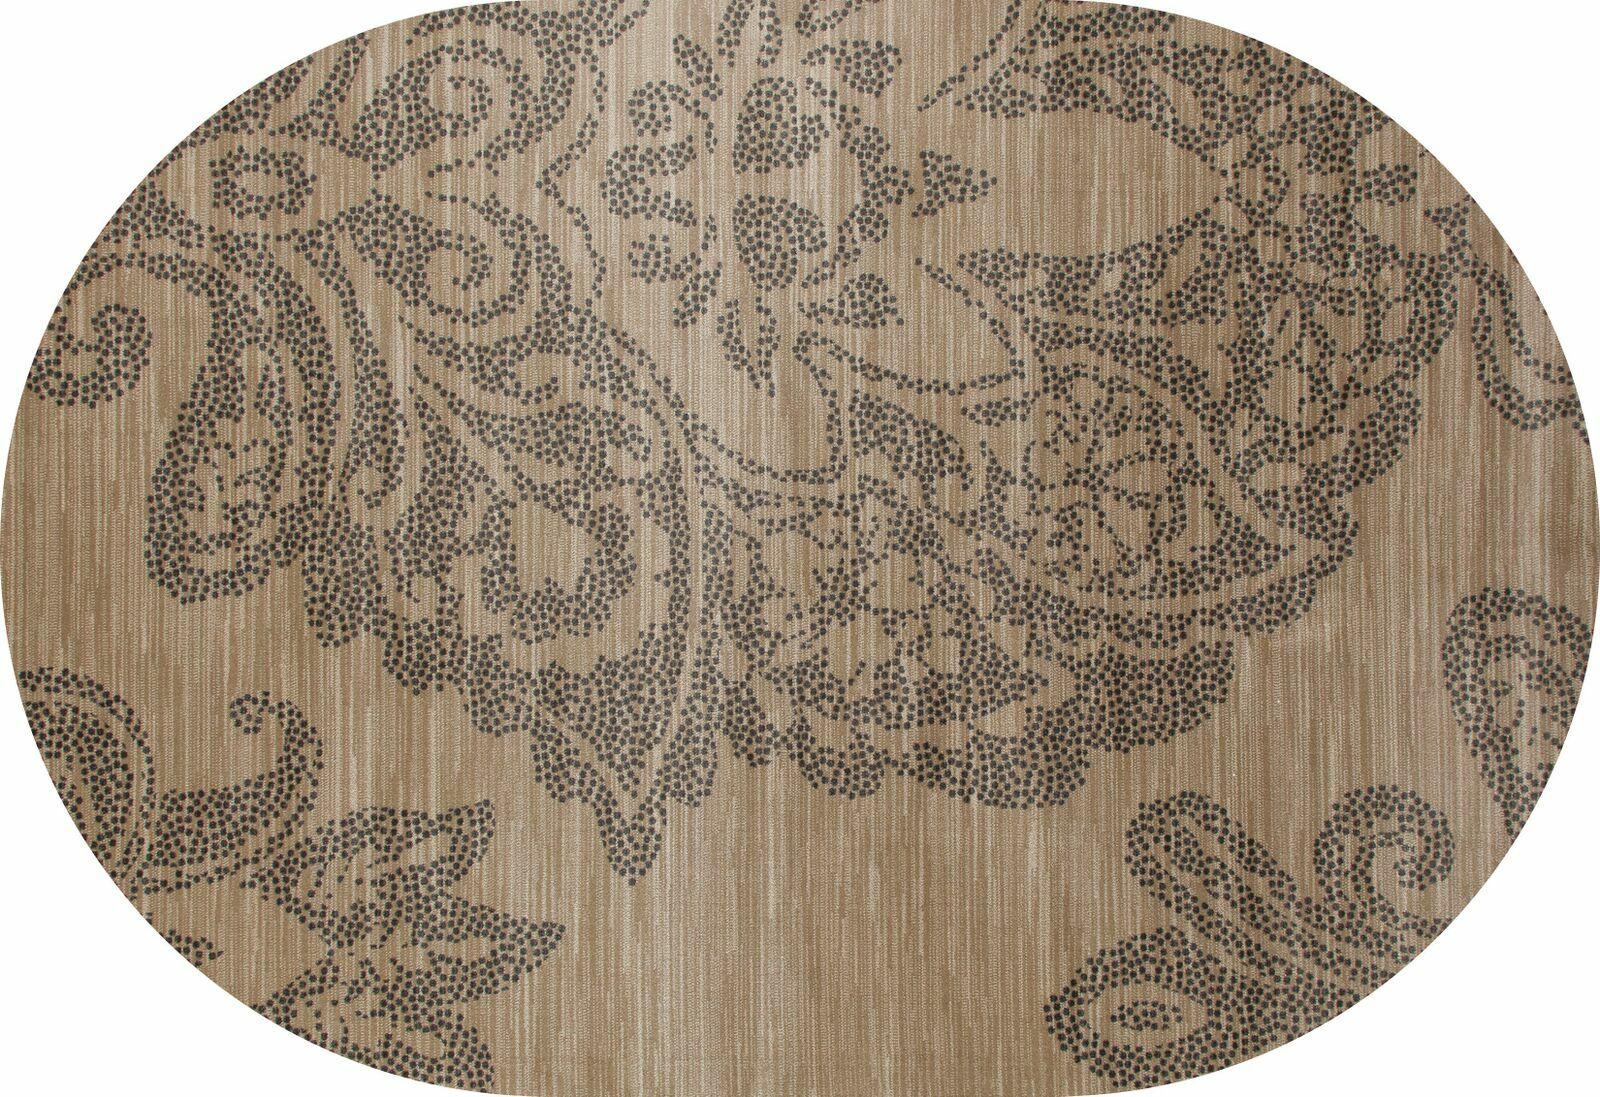 Klahn Beige Area Rug Rug Size: OVAL 6'7 x 9'6